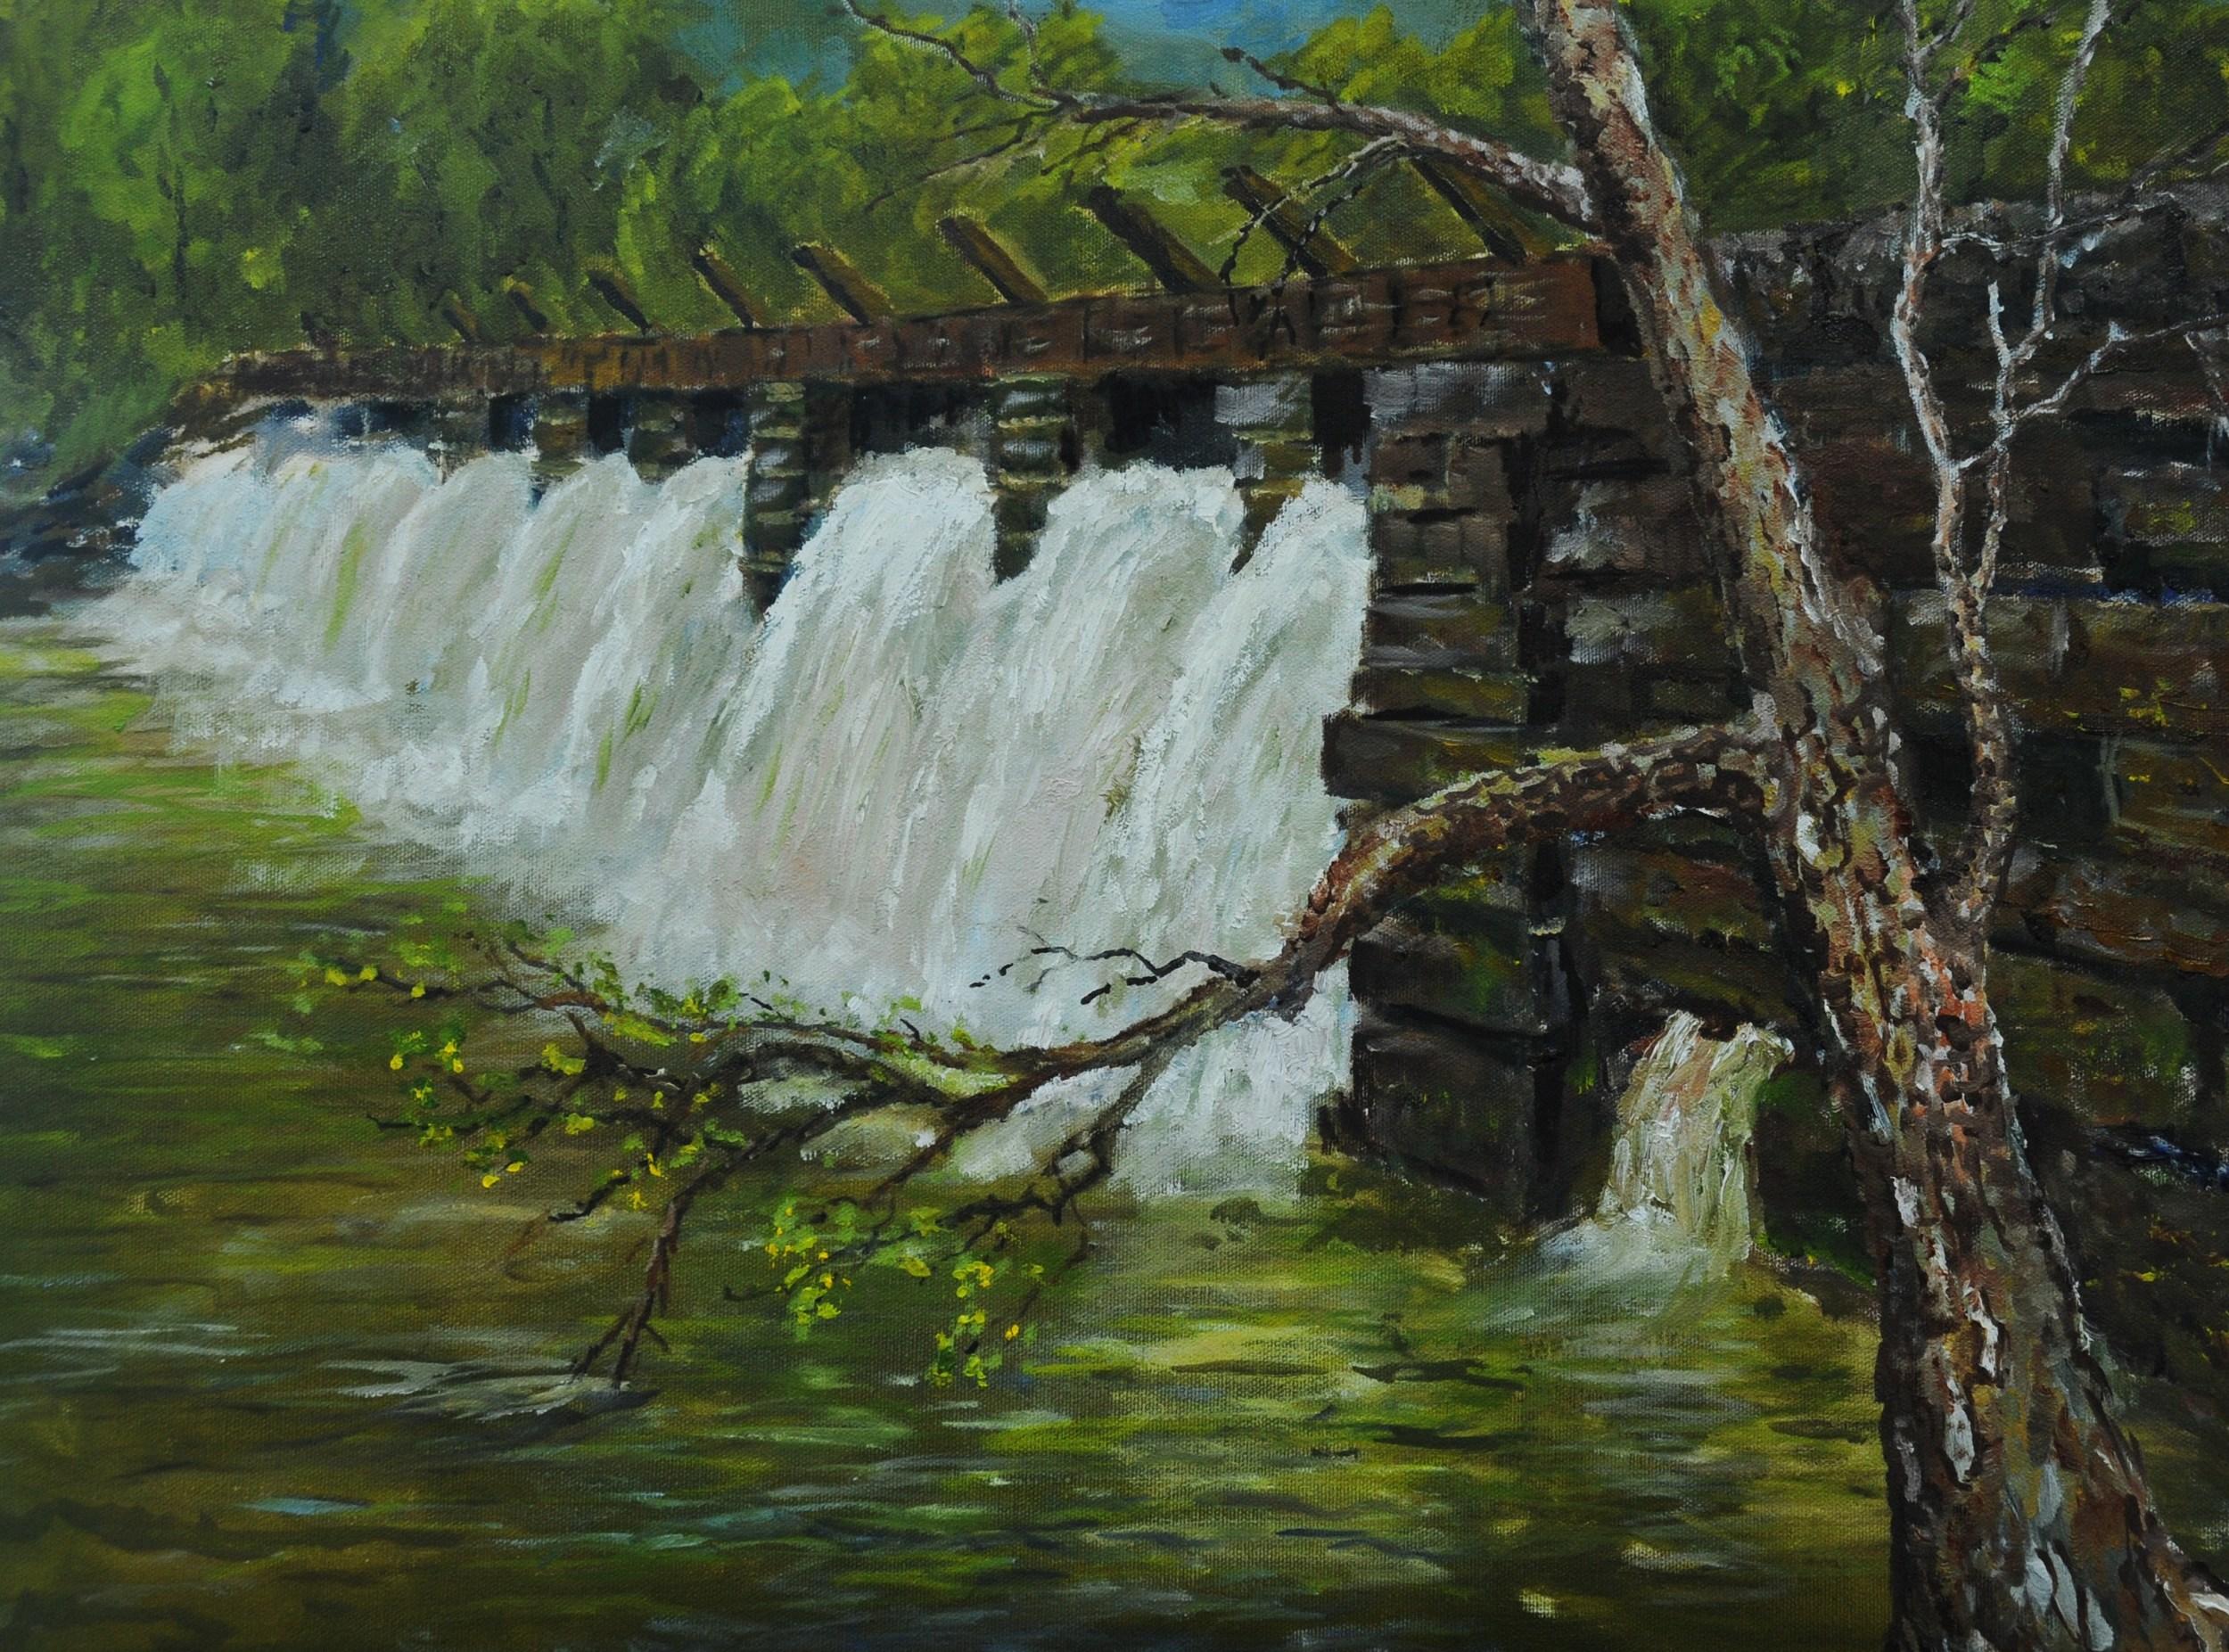 Shaddon Mill Dam